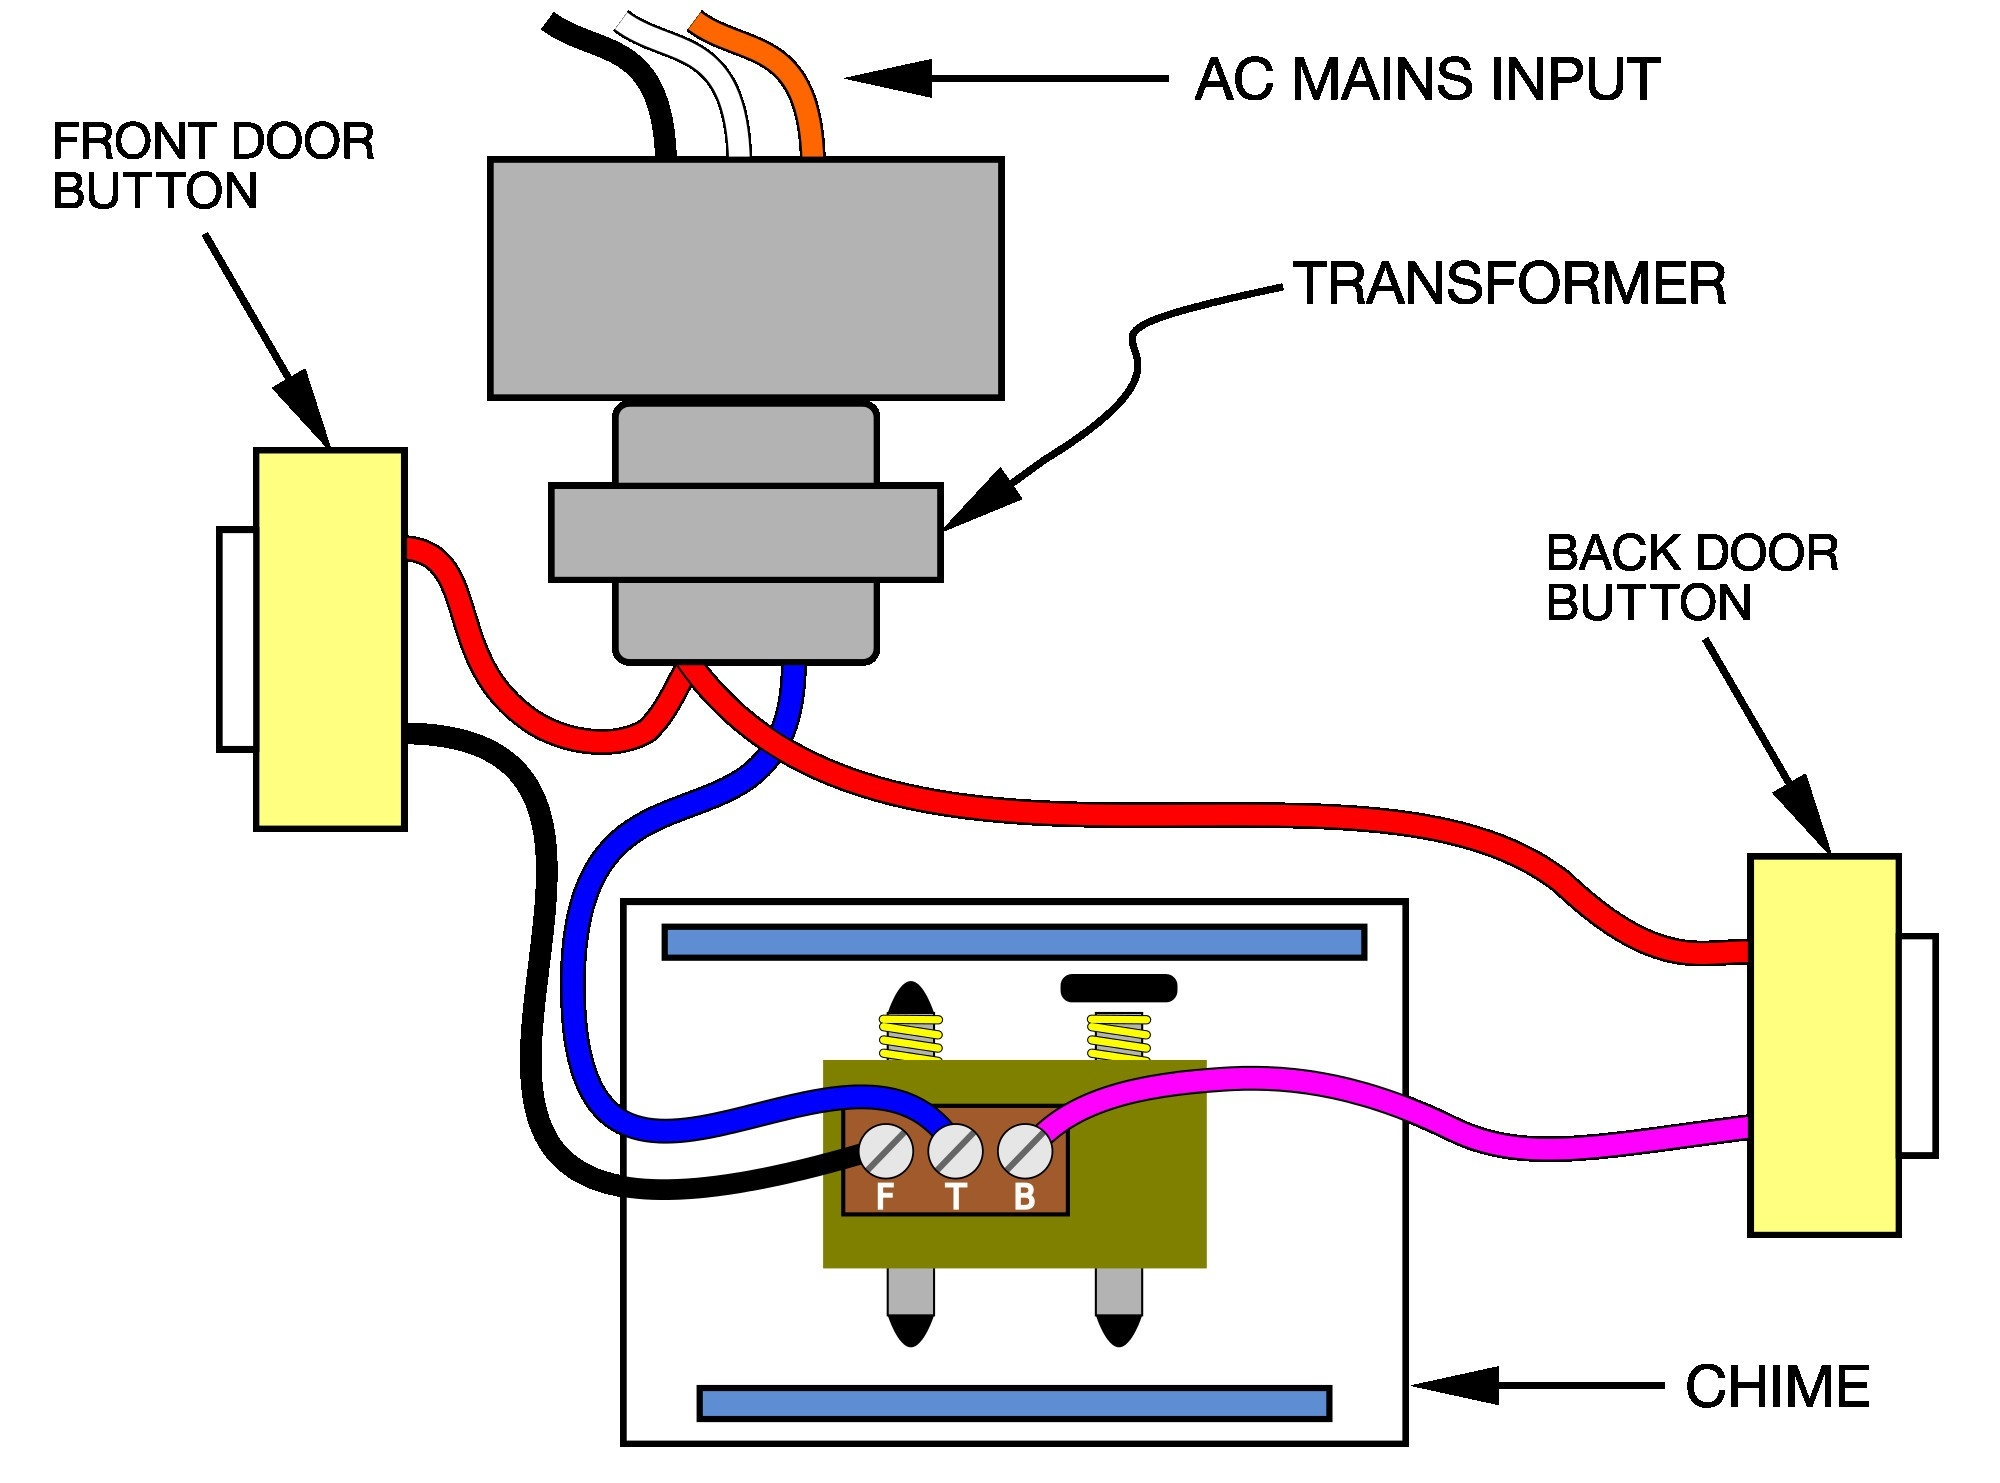 1965 ford falcon wiring diagram 2005 honda civic ac ricardolevinsmorales com wp content uploads 2018 0